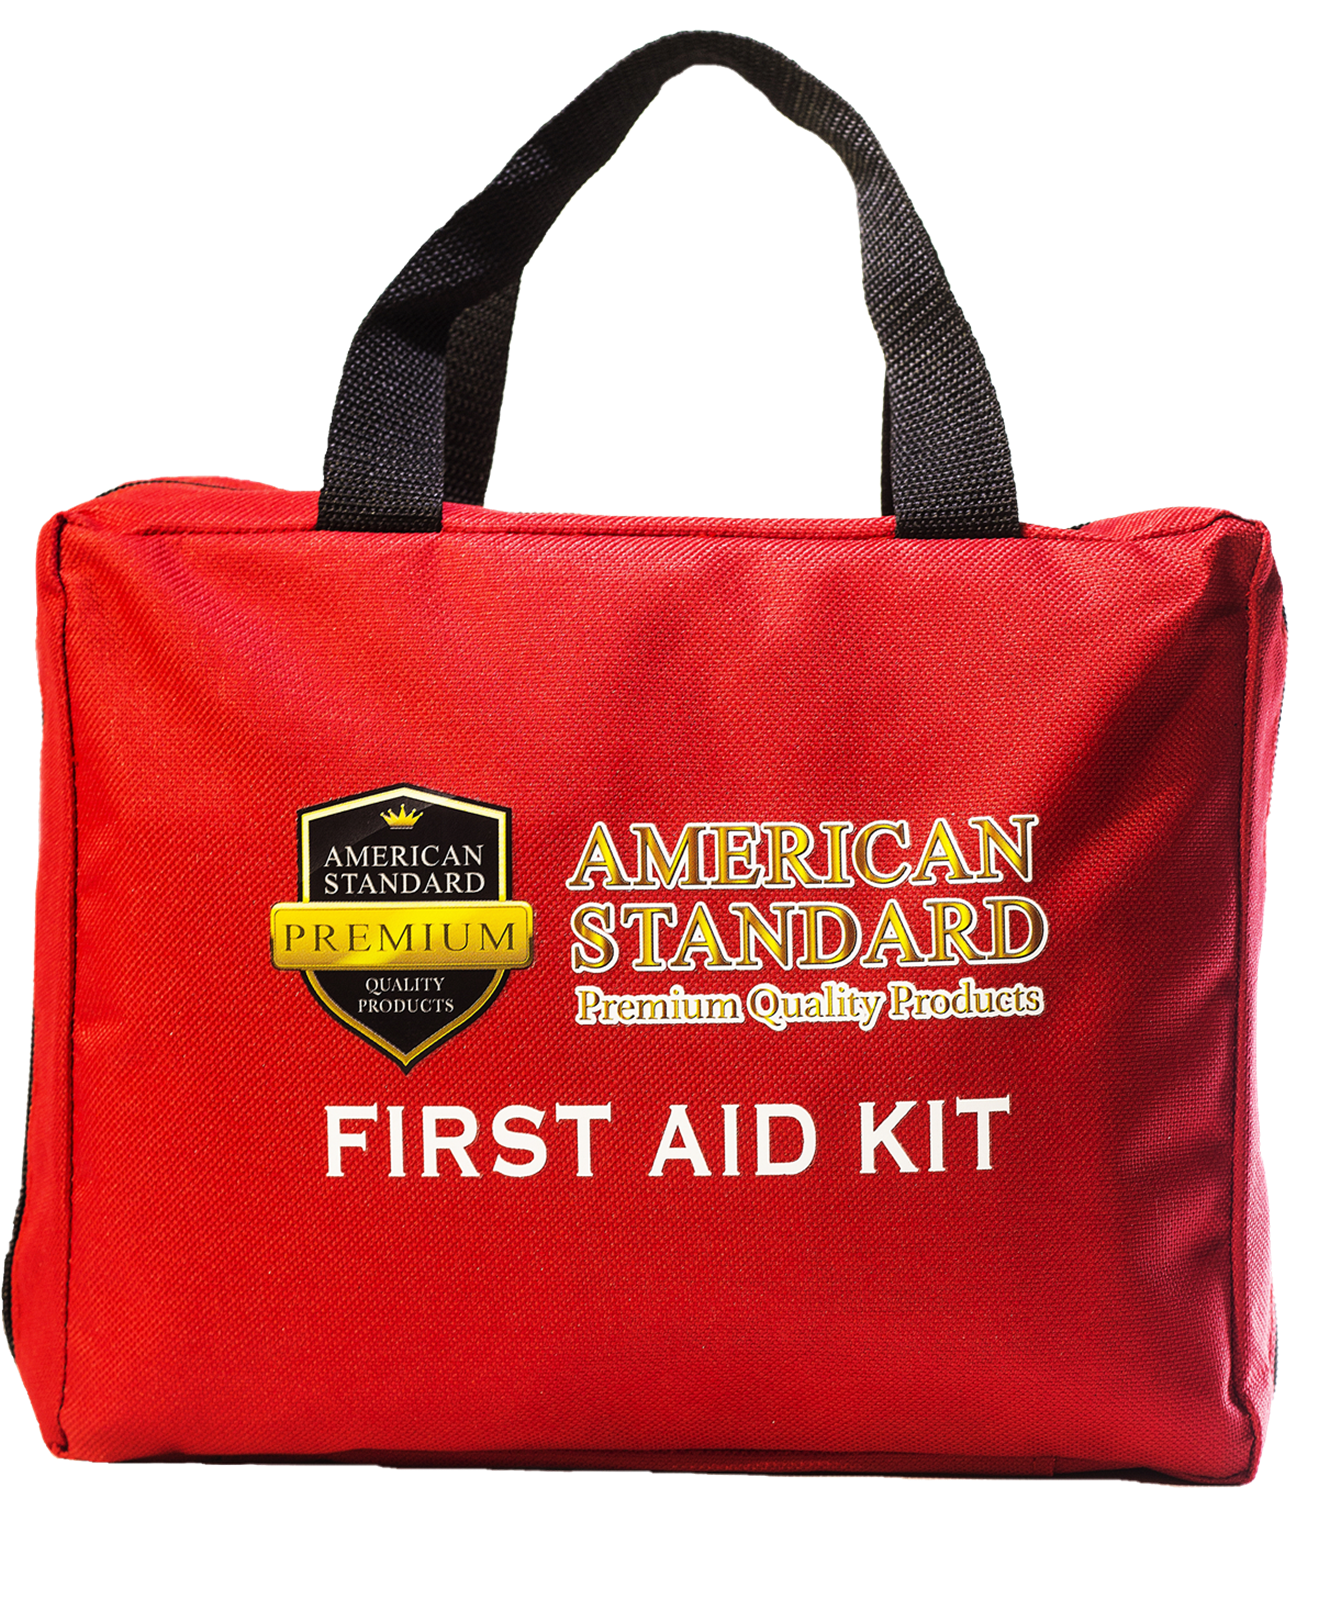 First Aid Kit Emergency Medical & Survival Bag OSHA